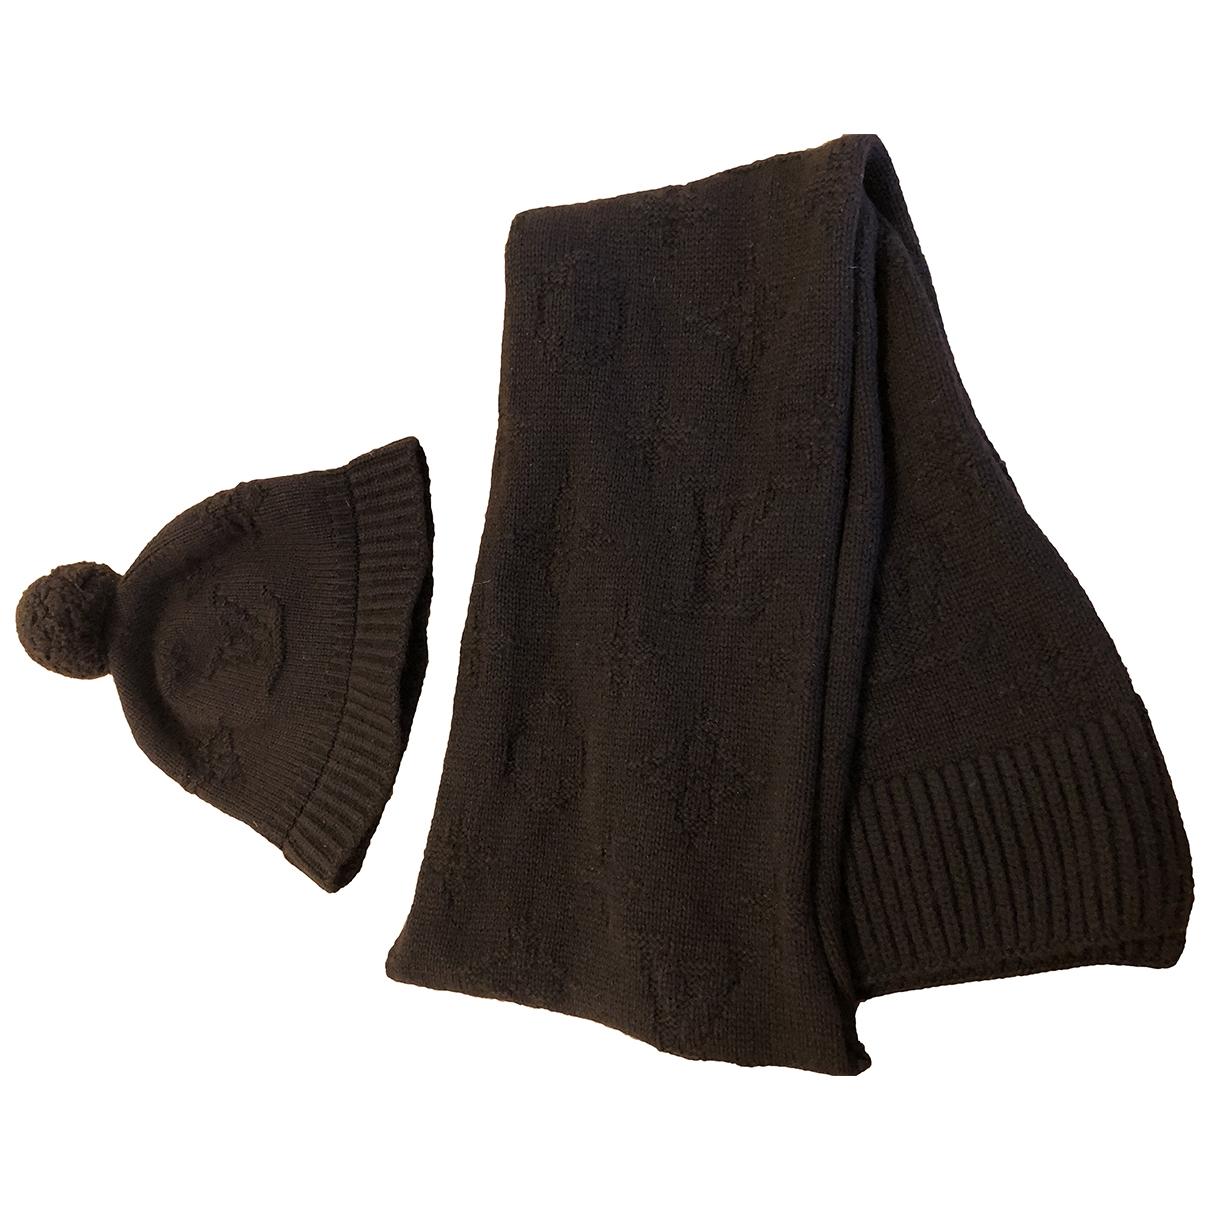 Louis Vuitton \N Brown Cashmere scarf for Women M International